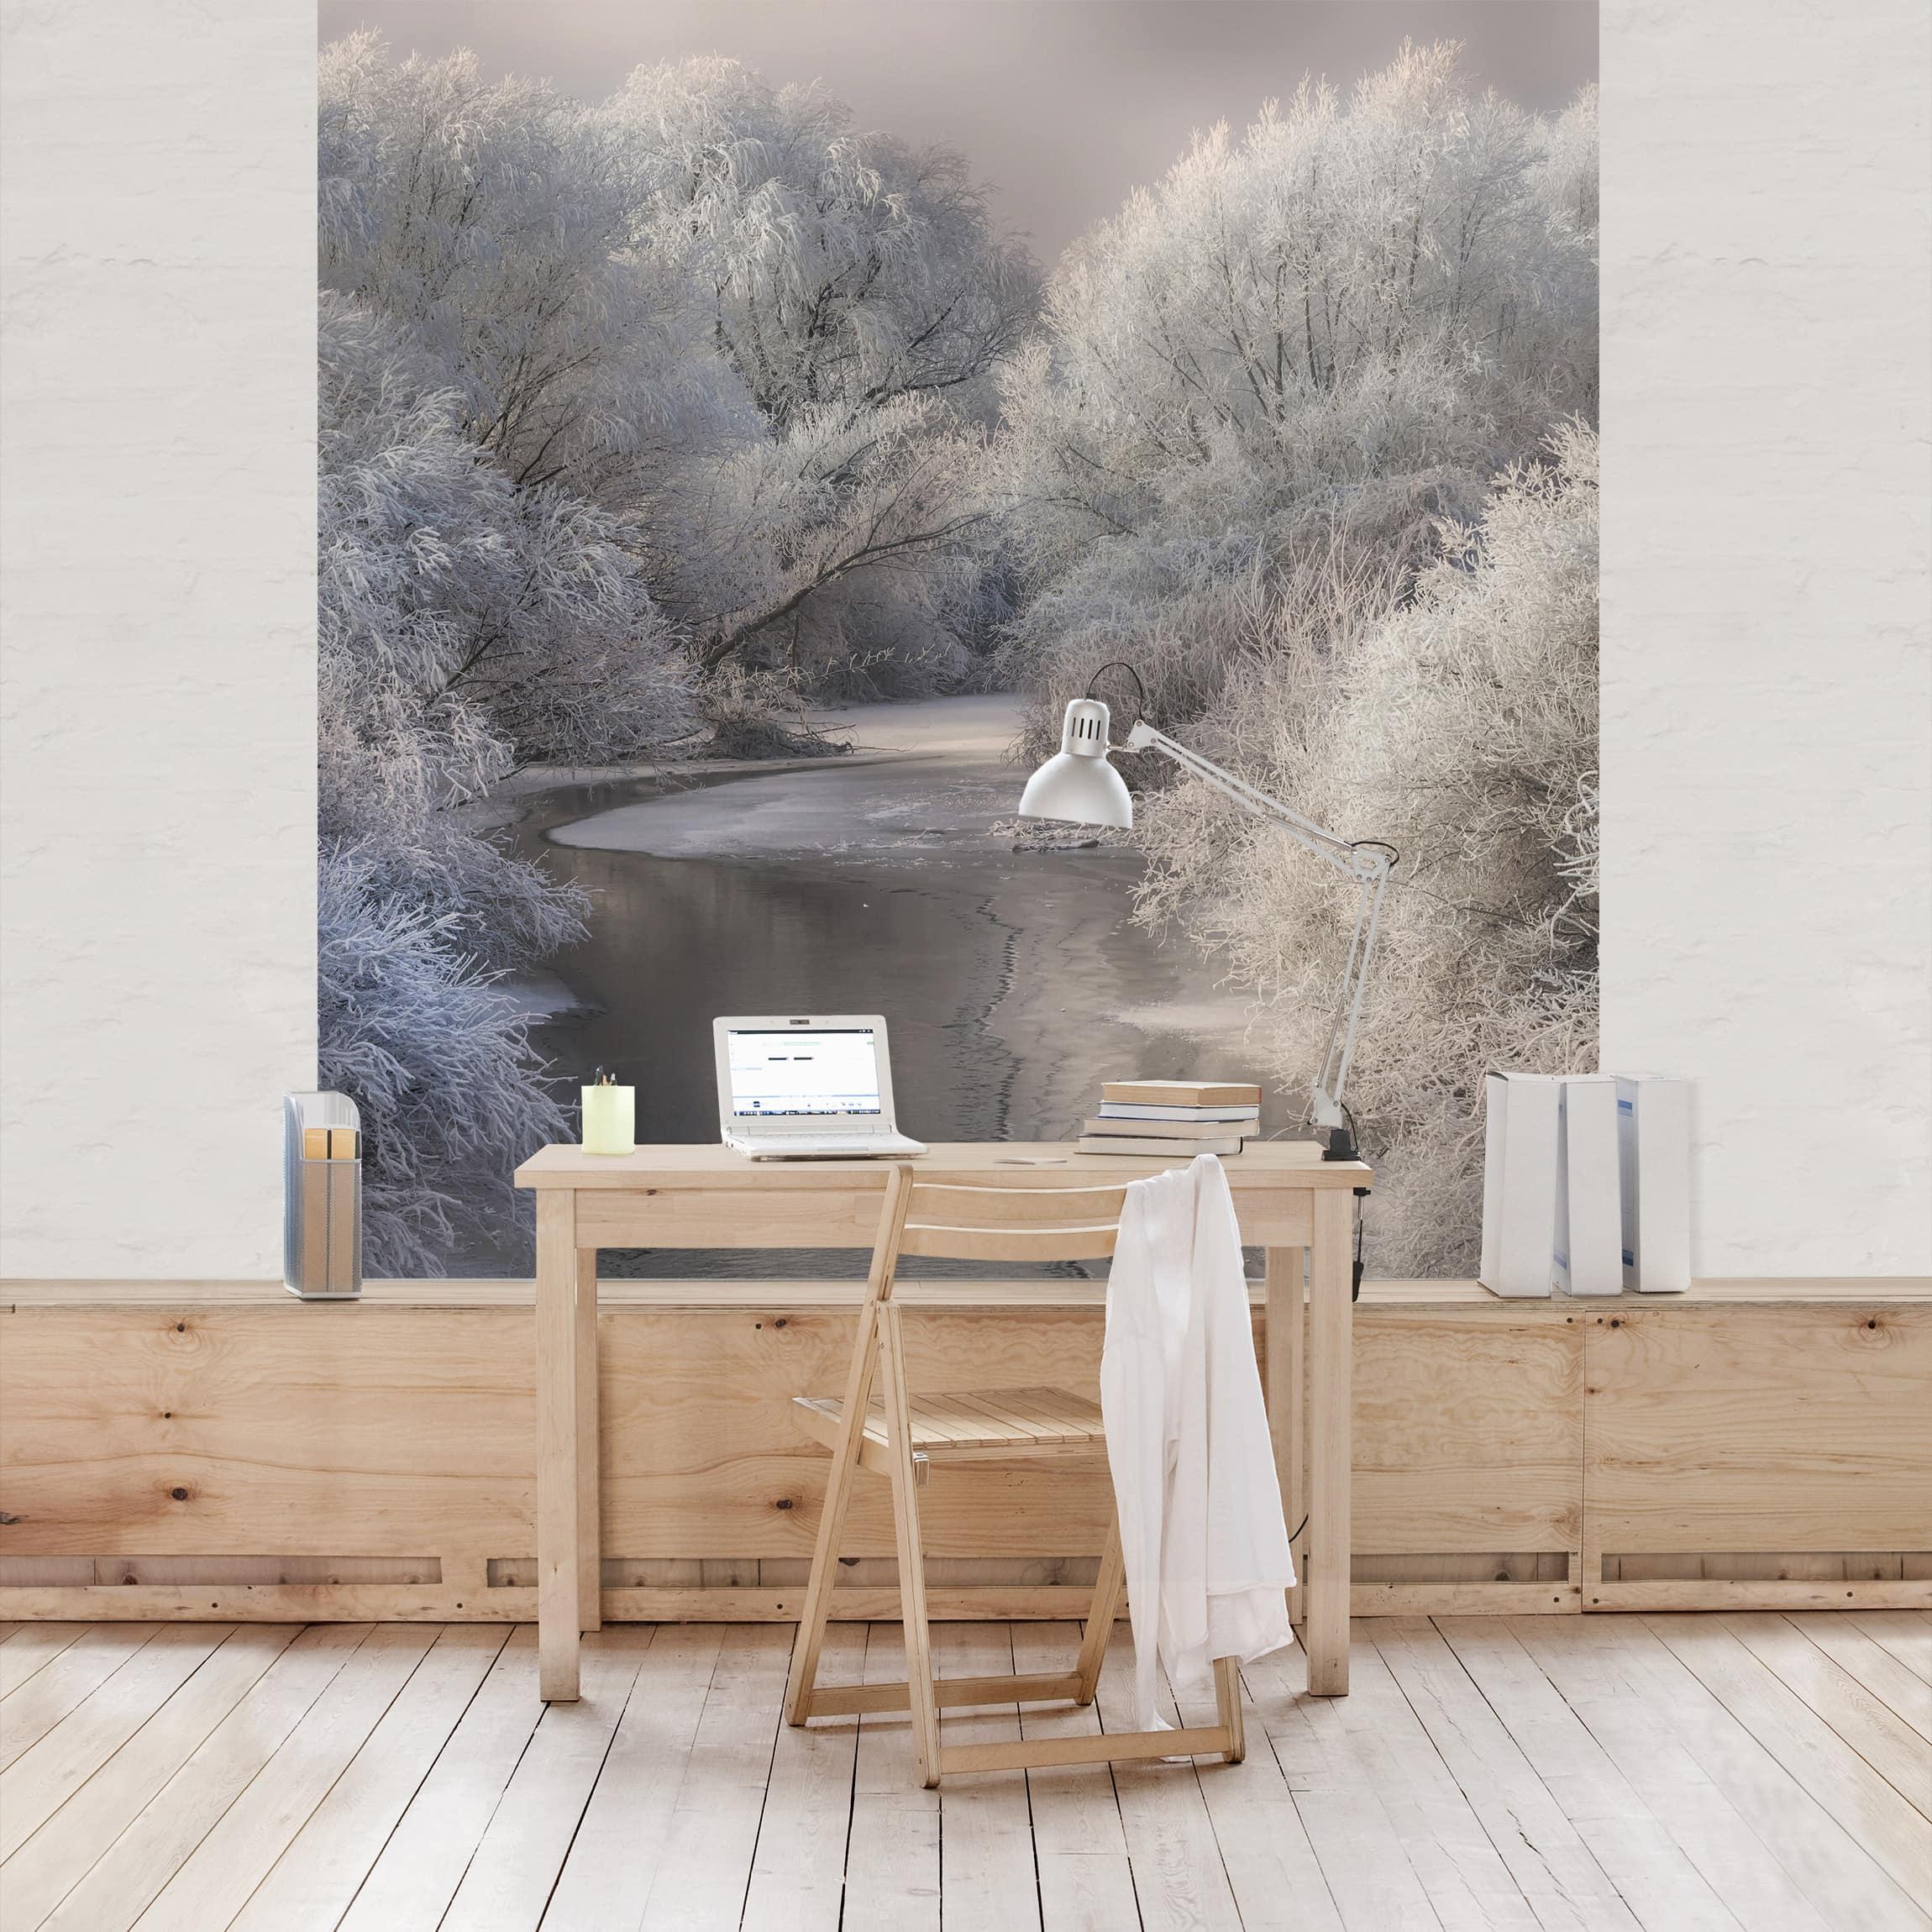 tapete selbstklebend winter song wandbild quadratisch. Black Bedroom Furniture Sets. Home Design Ideas